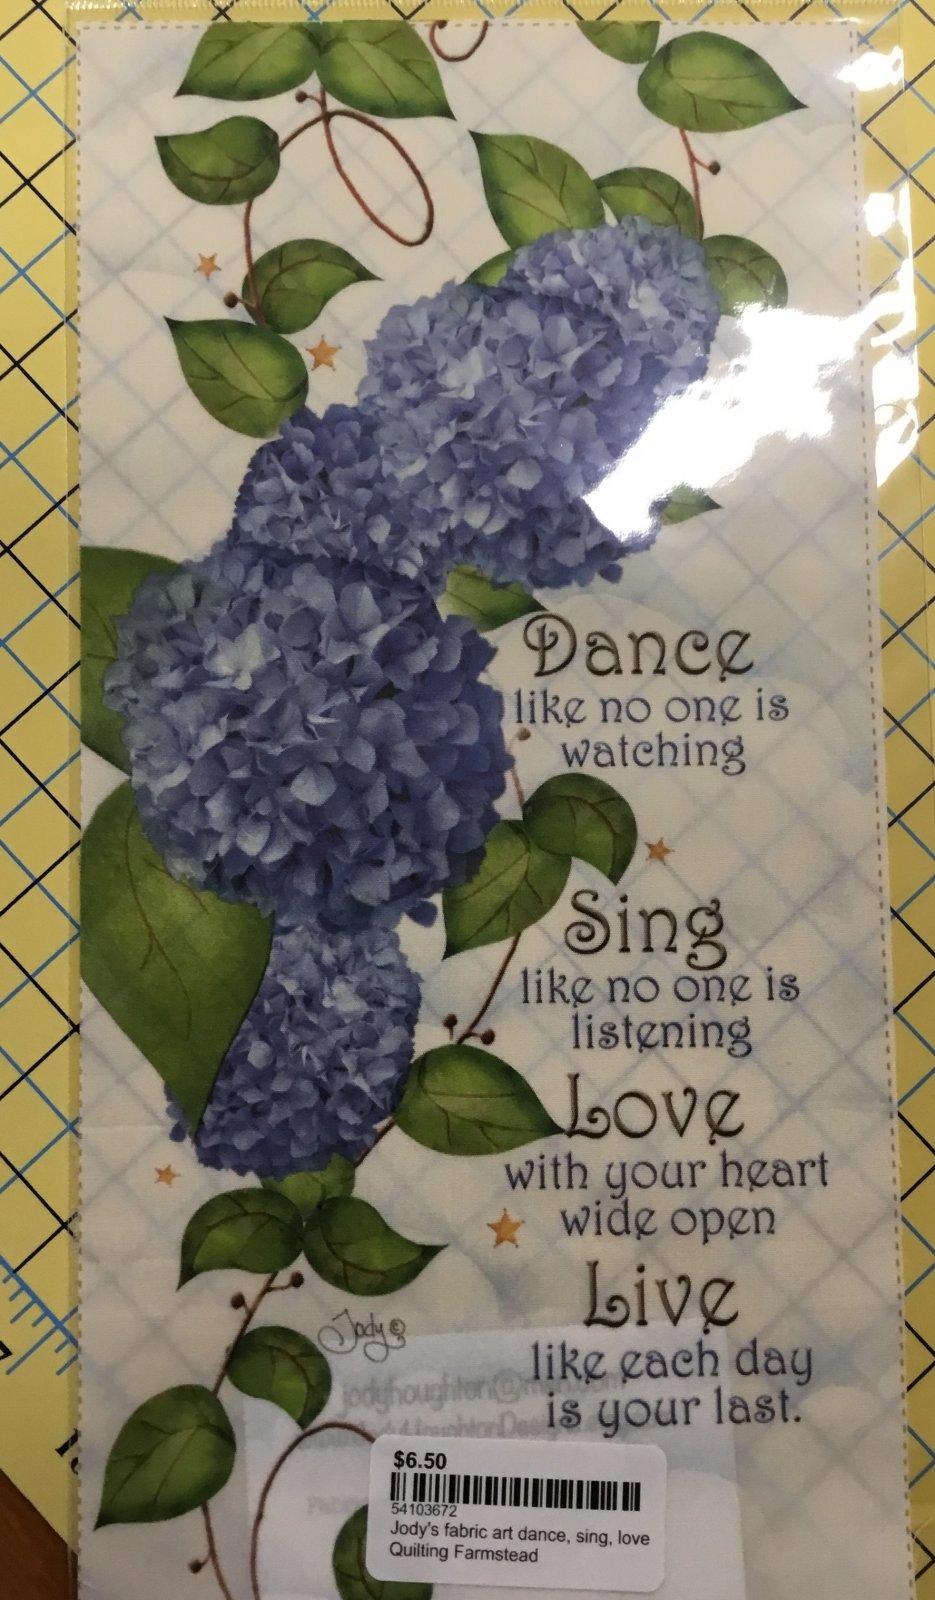 Jody's fabric art dance, sing, love